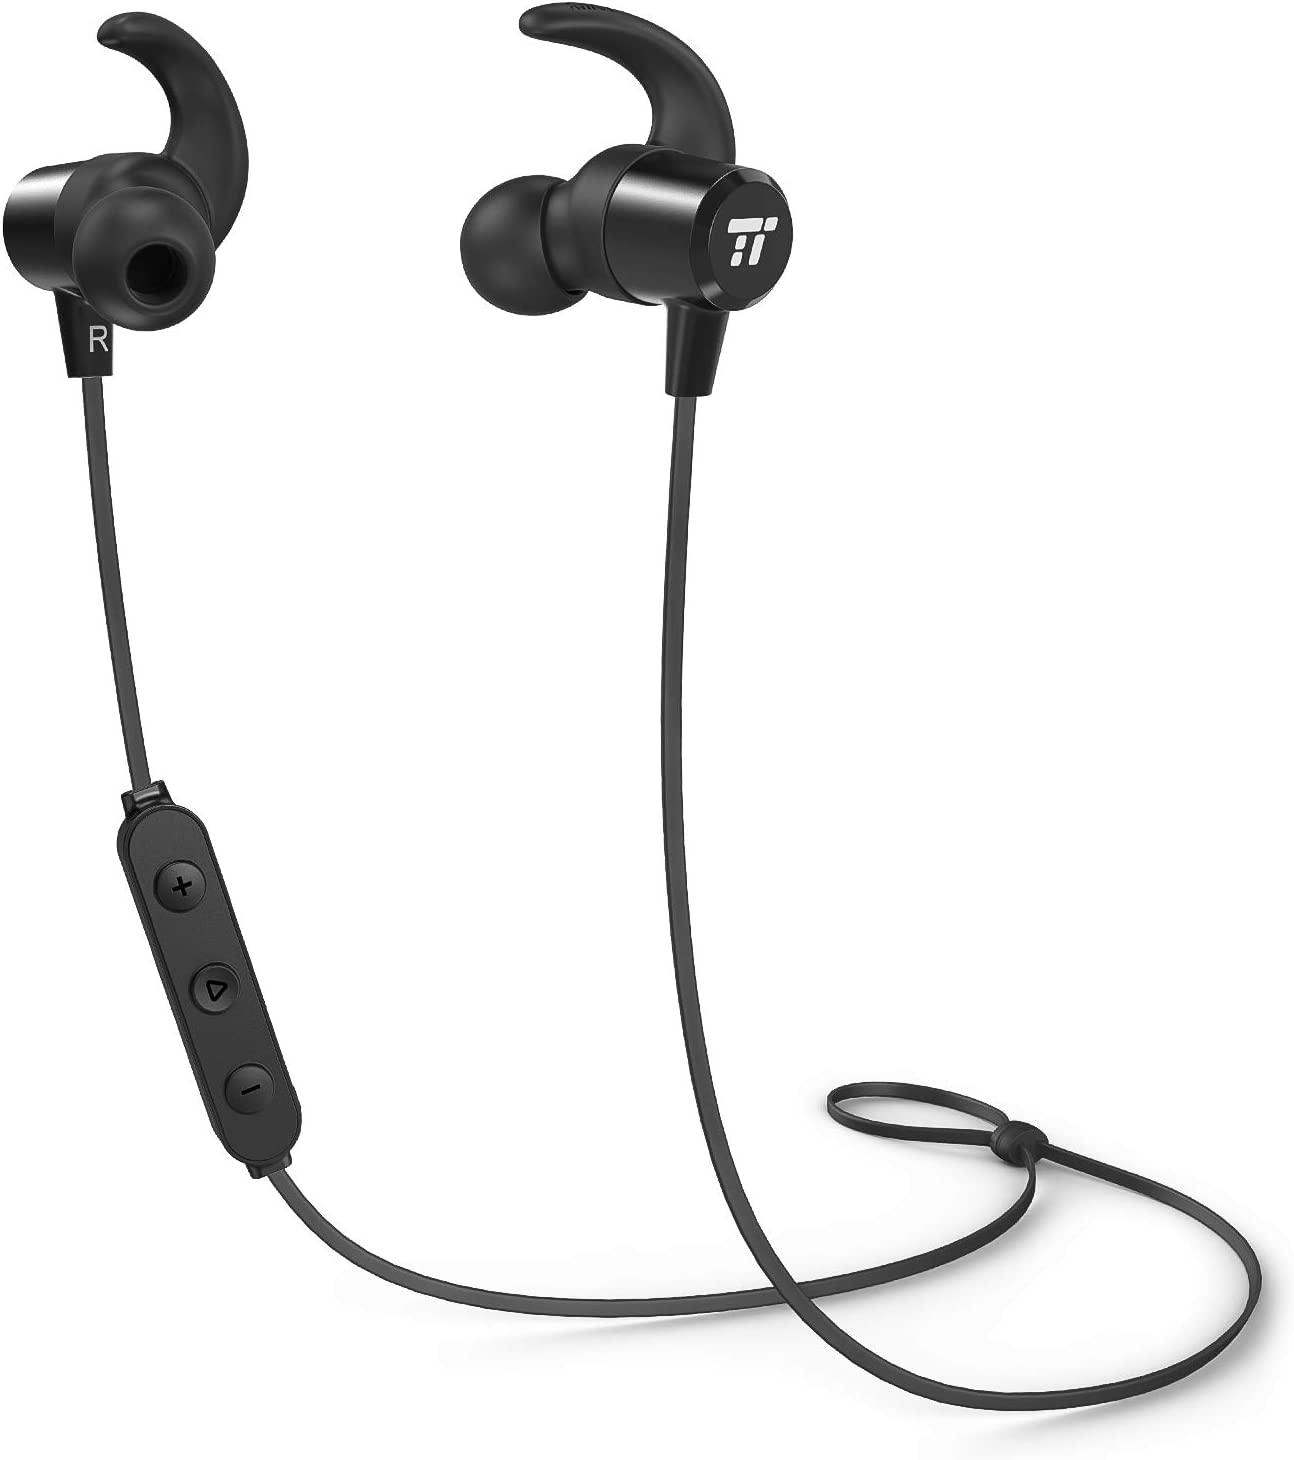 Auriculares Bluetooth Inalambricos Deportivos TaoTronics Auricular Bluetooth Magnético con Mic Estéreo 8 Horas para iPad iOS Android Tablet PC Samsung Galaxy Sony Huawei: Amazon.es: Electrónica